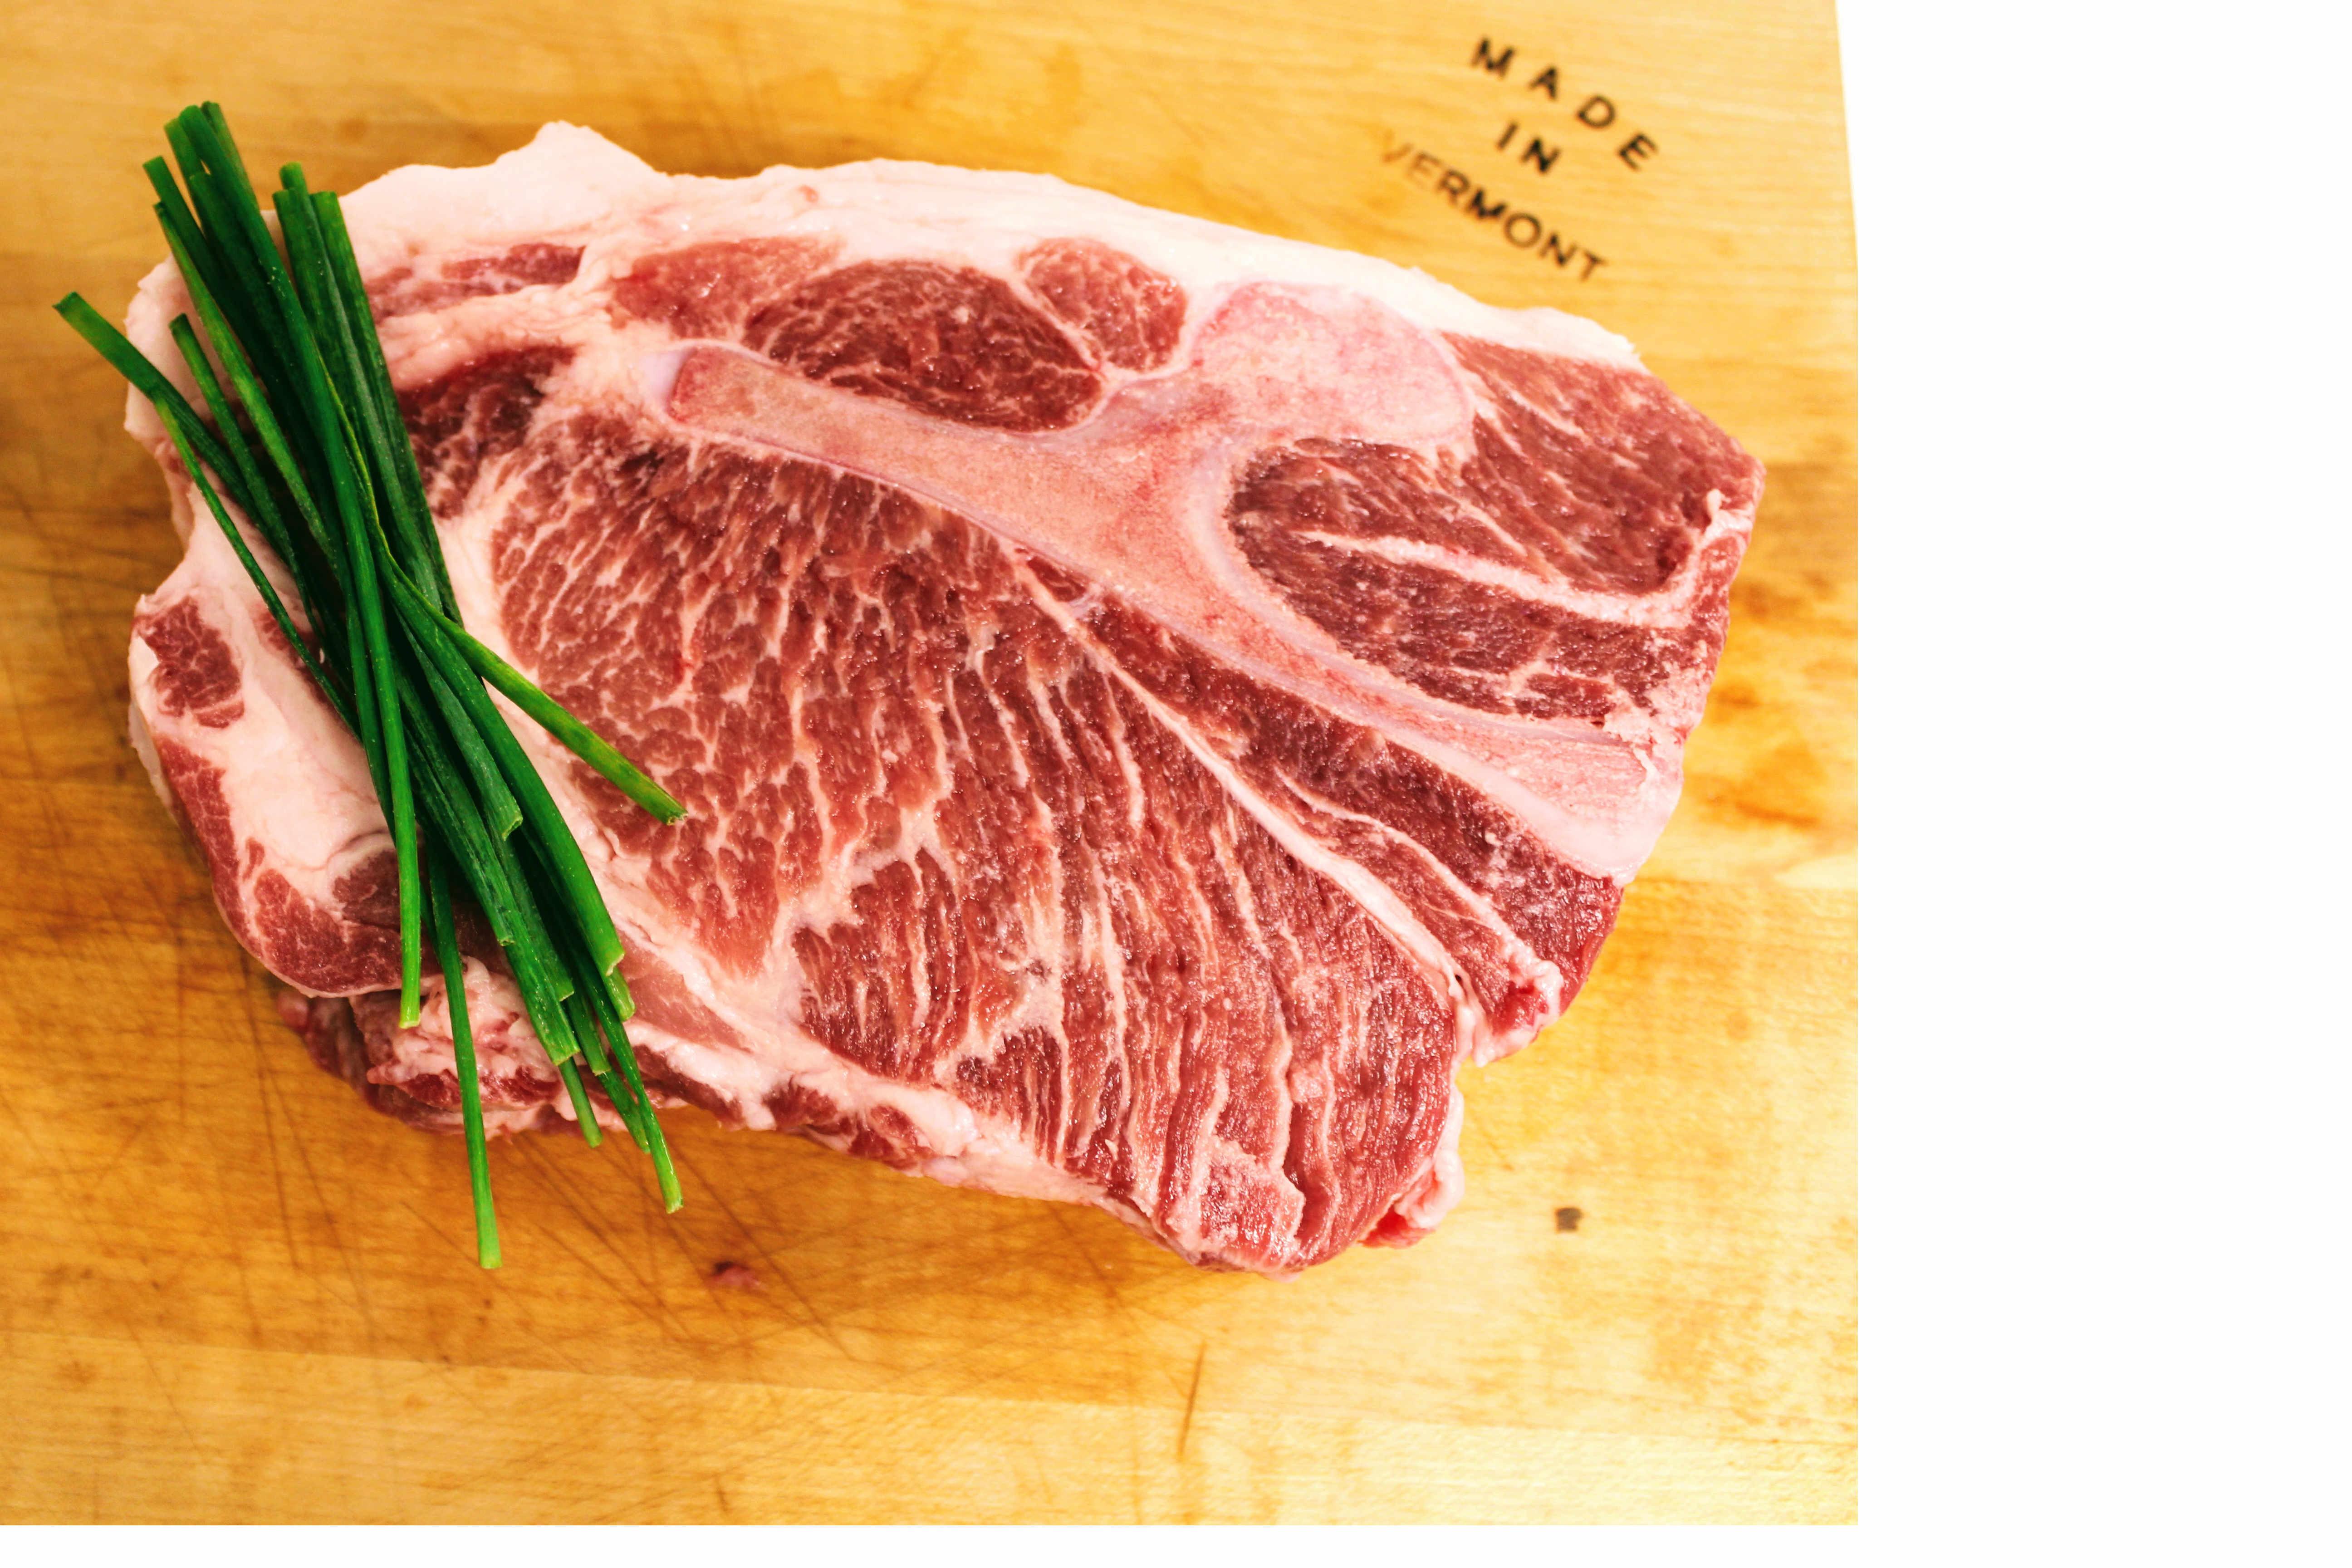 Pork - Shoulder Roast - Bone-in